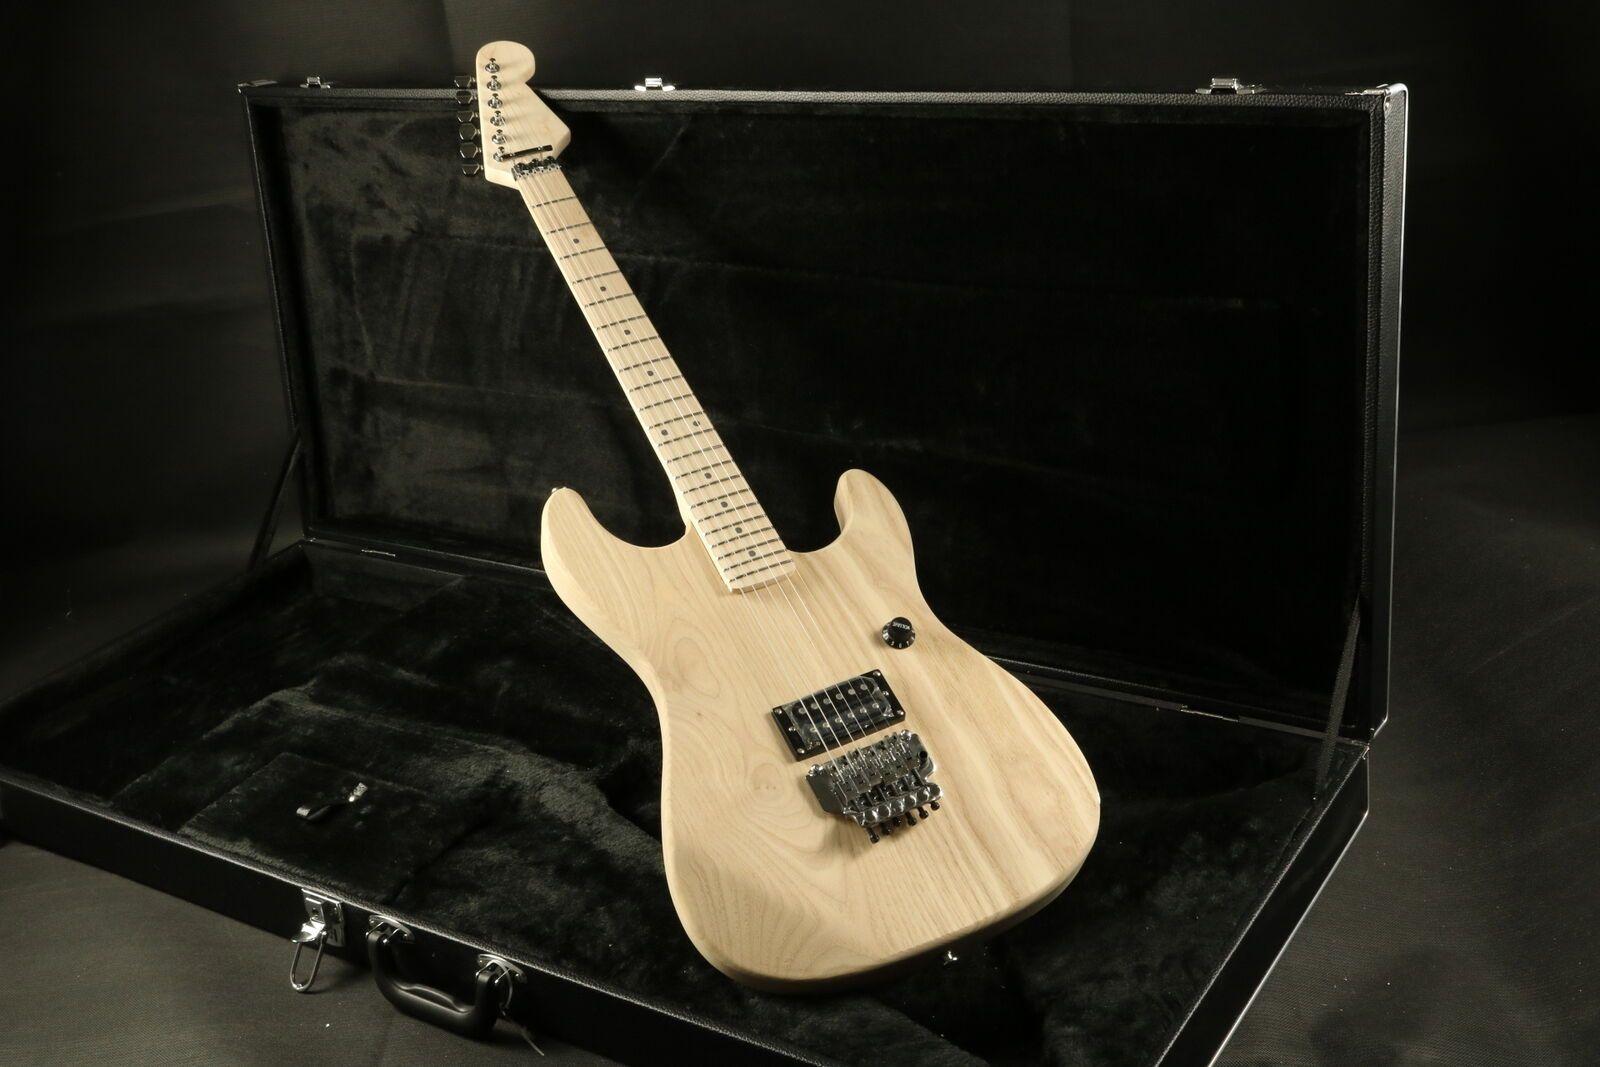 Unfinished ST Electric Guitar Kits Floyd Rose Bridge ASH Body Fingerboard Maple